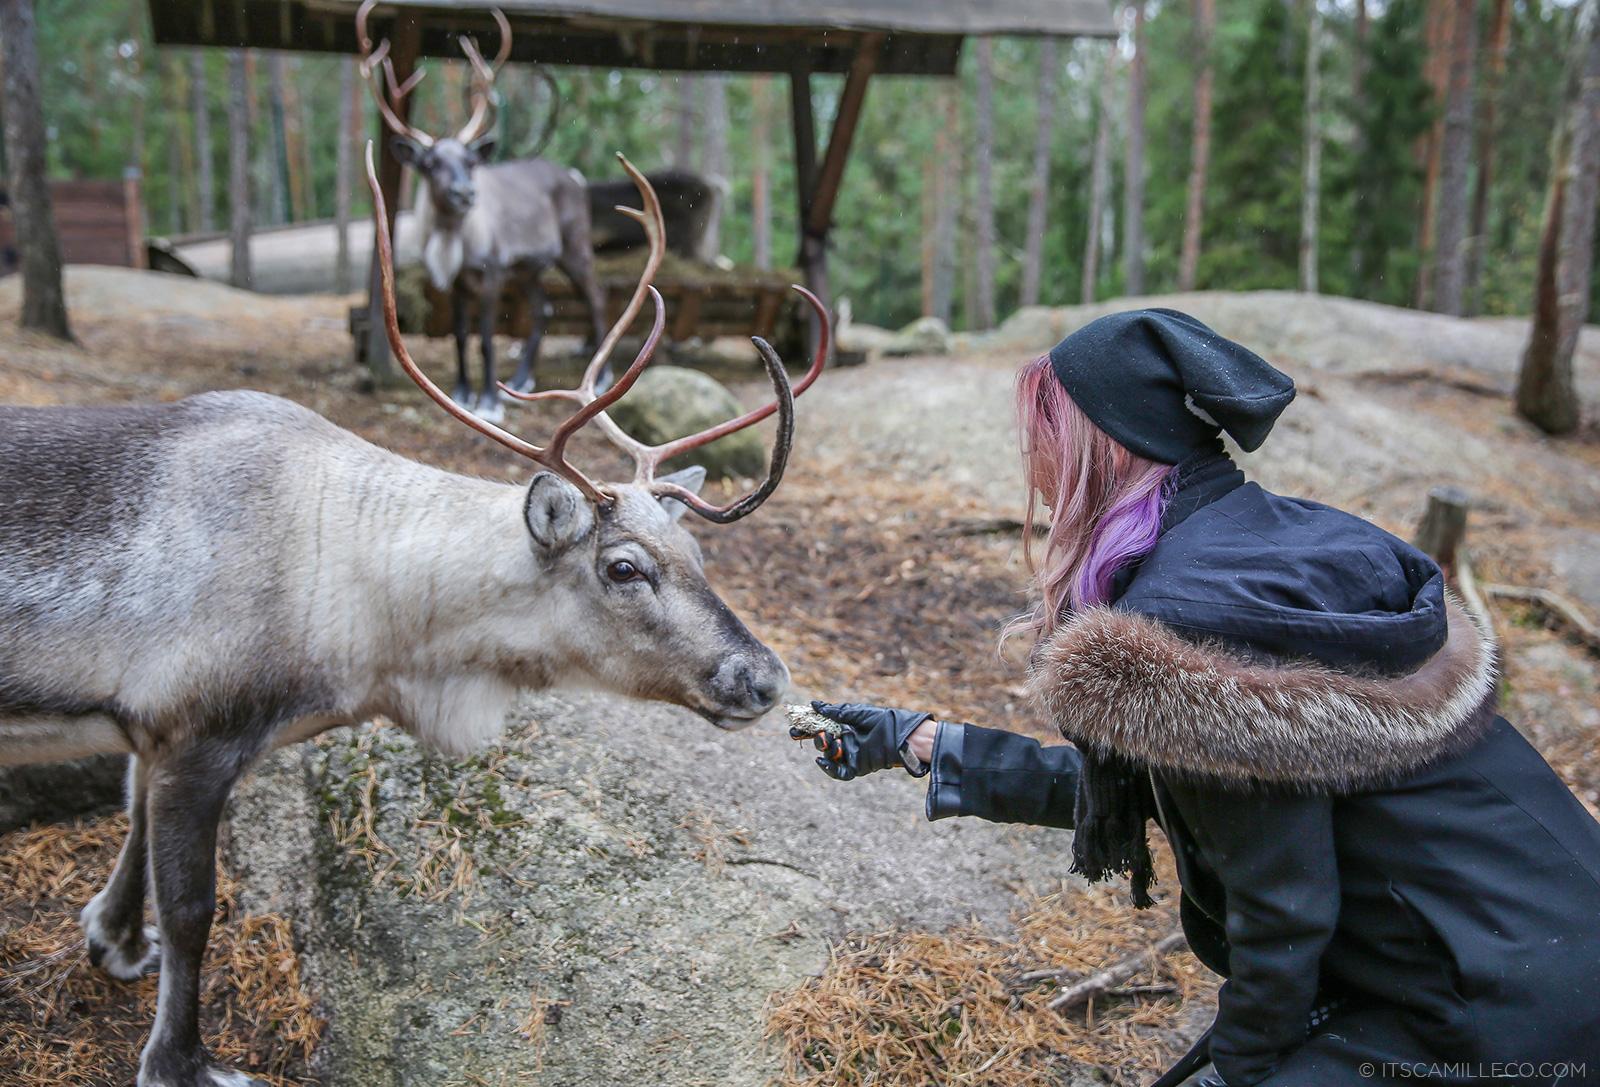 Reindeer Feeding in Finland - www.itscamilleco.com